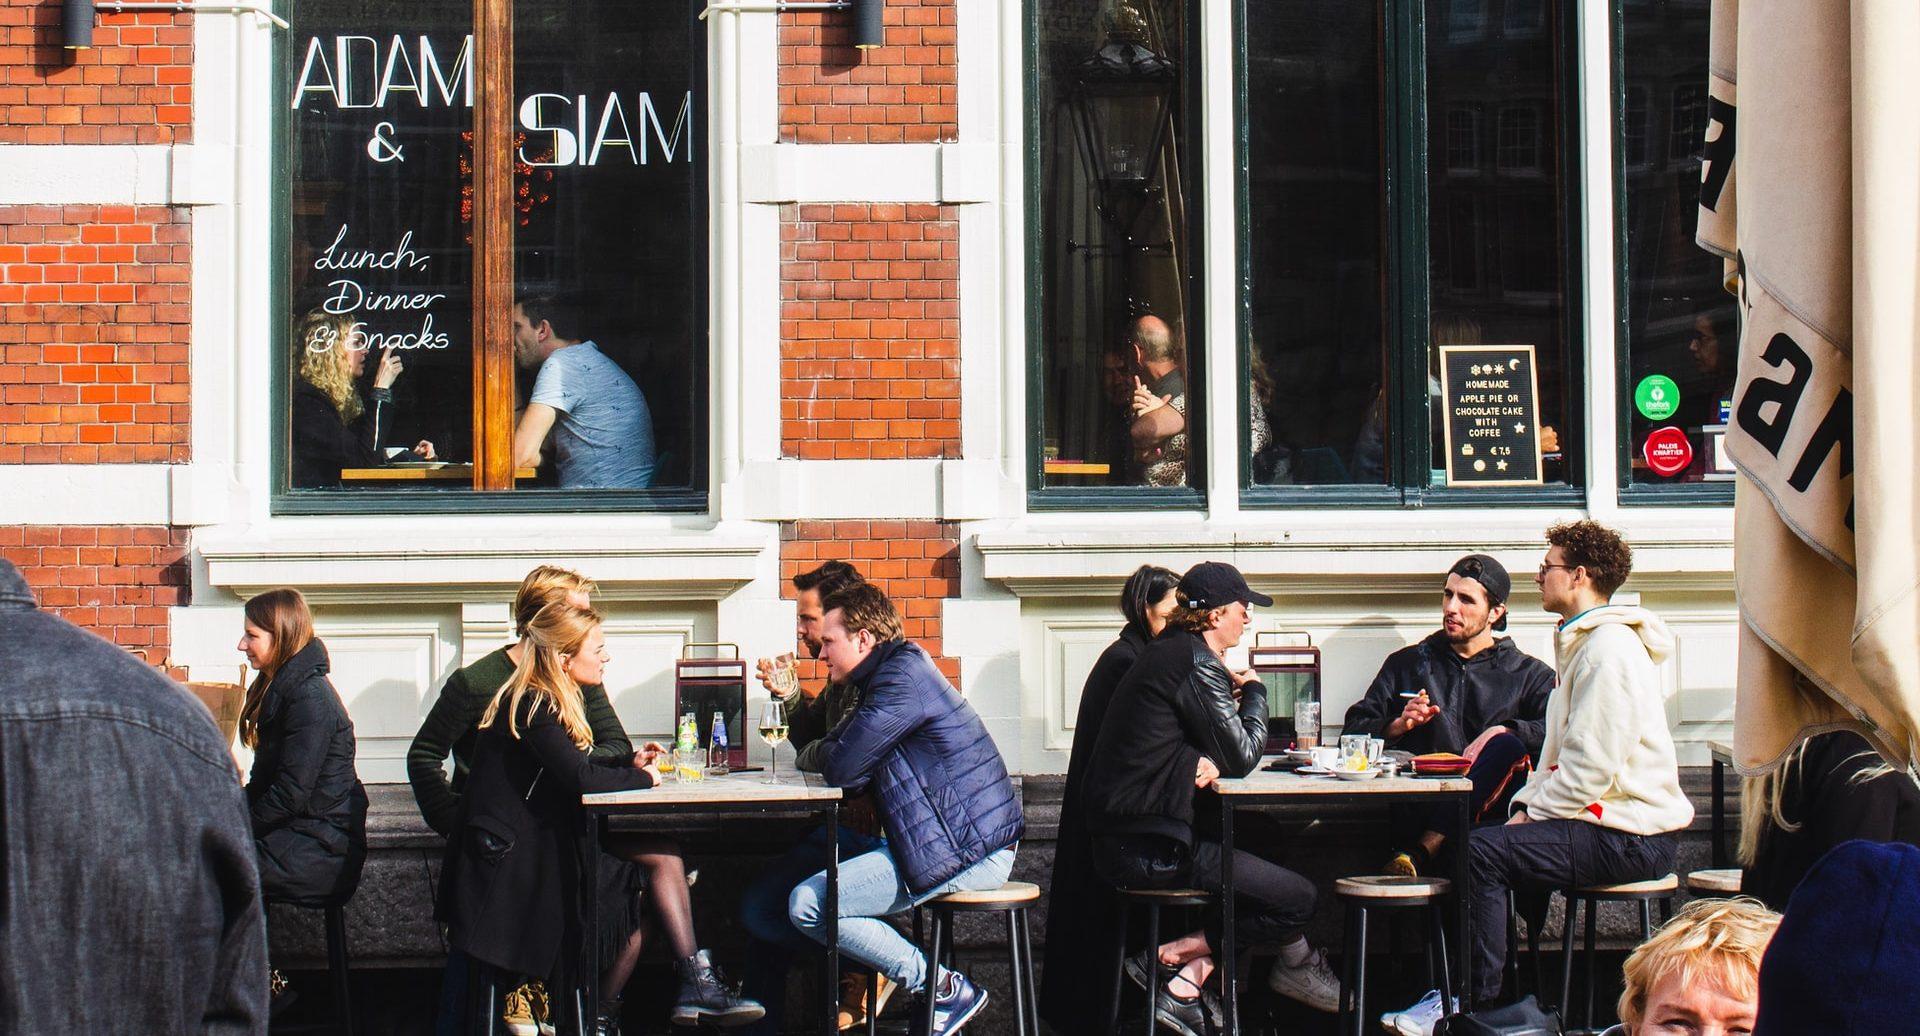 restaurants reopen; covidrestaurants